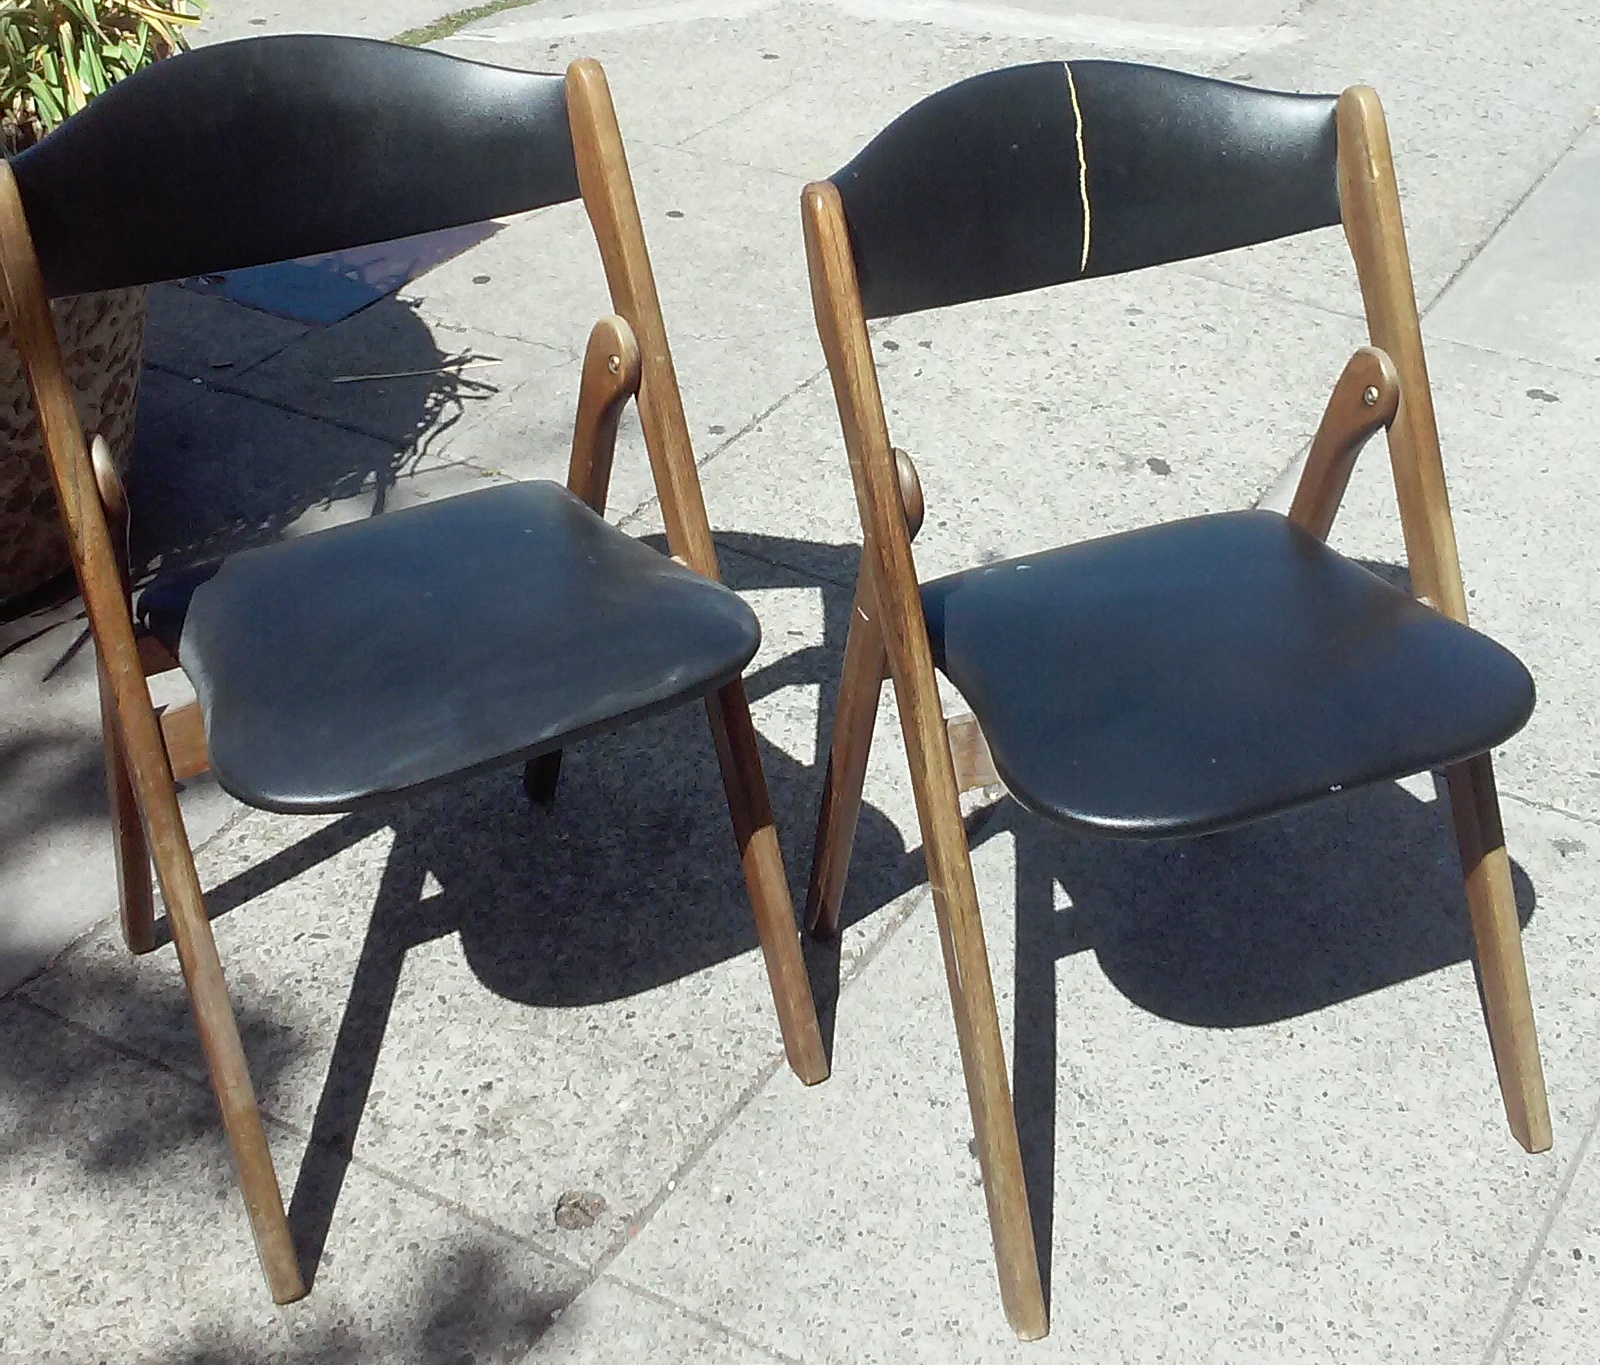 Coronet Folding Chairs Diy Dining Uhuru Furniture Collectibles Sold 5864 Wonderfold Vintage 35 Pair